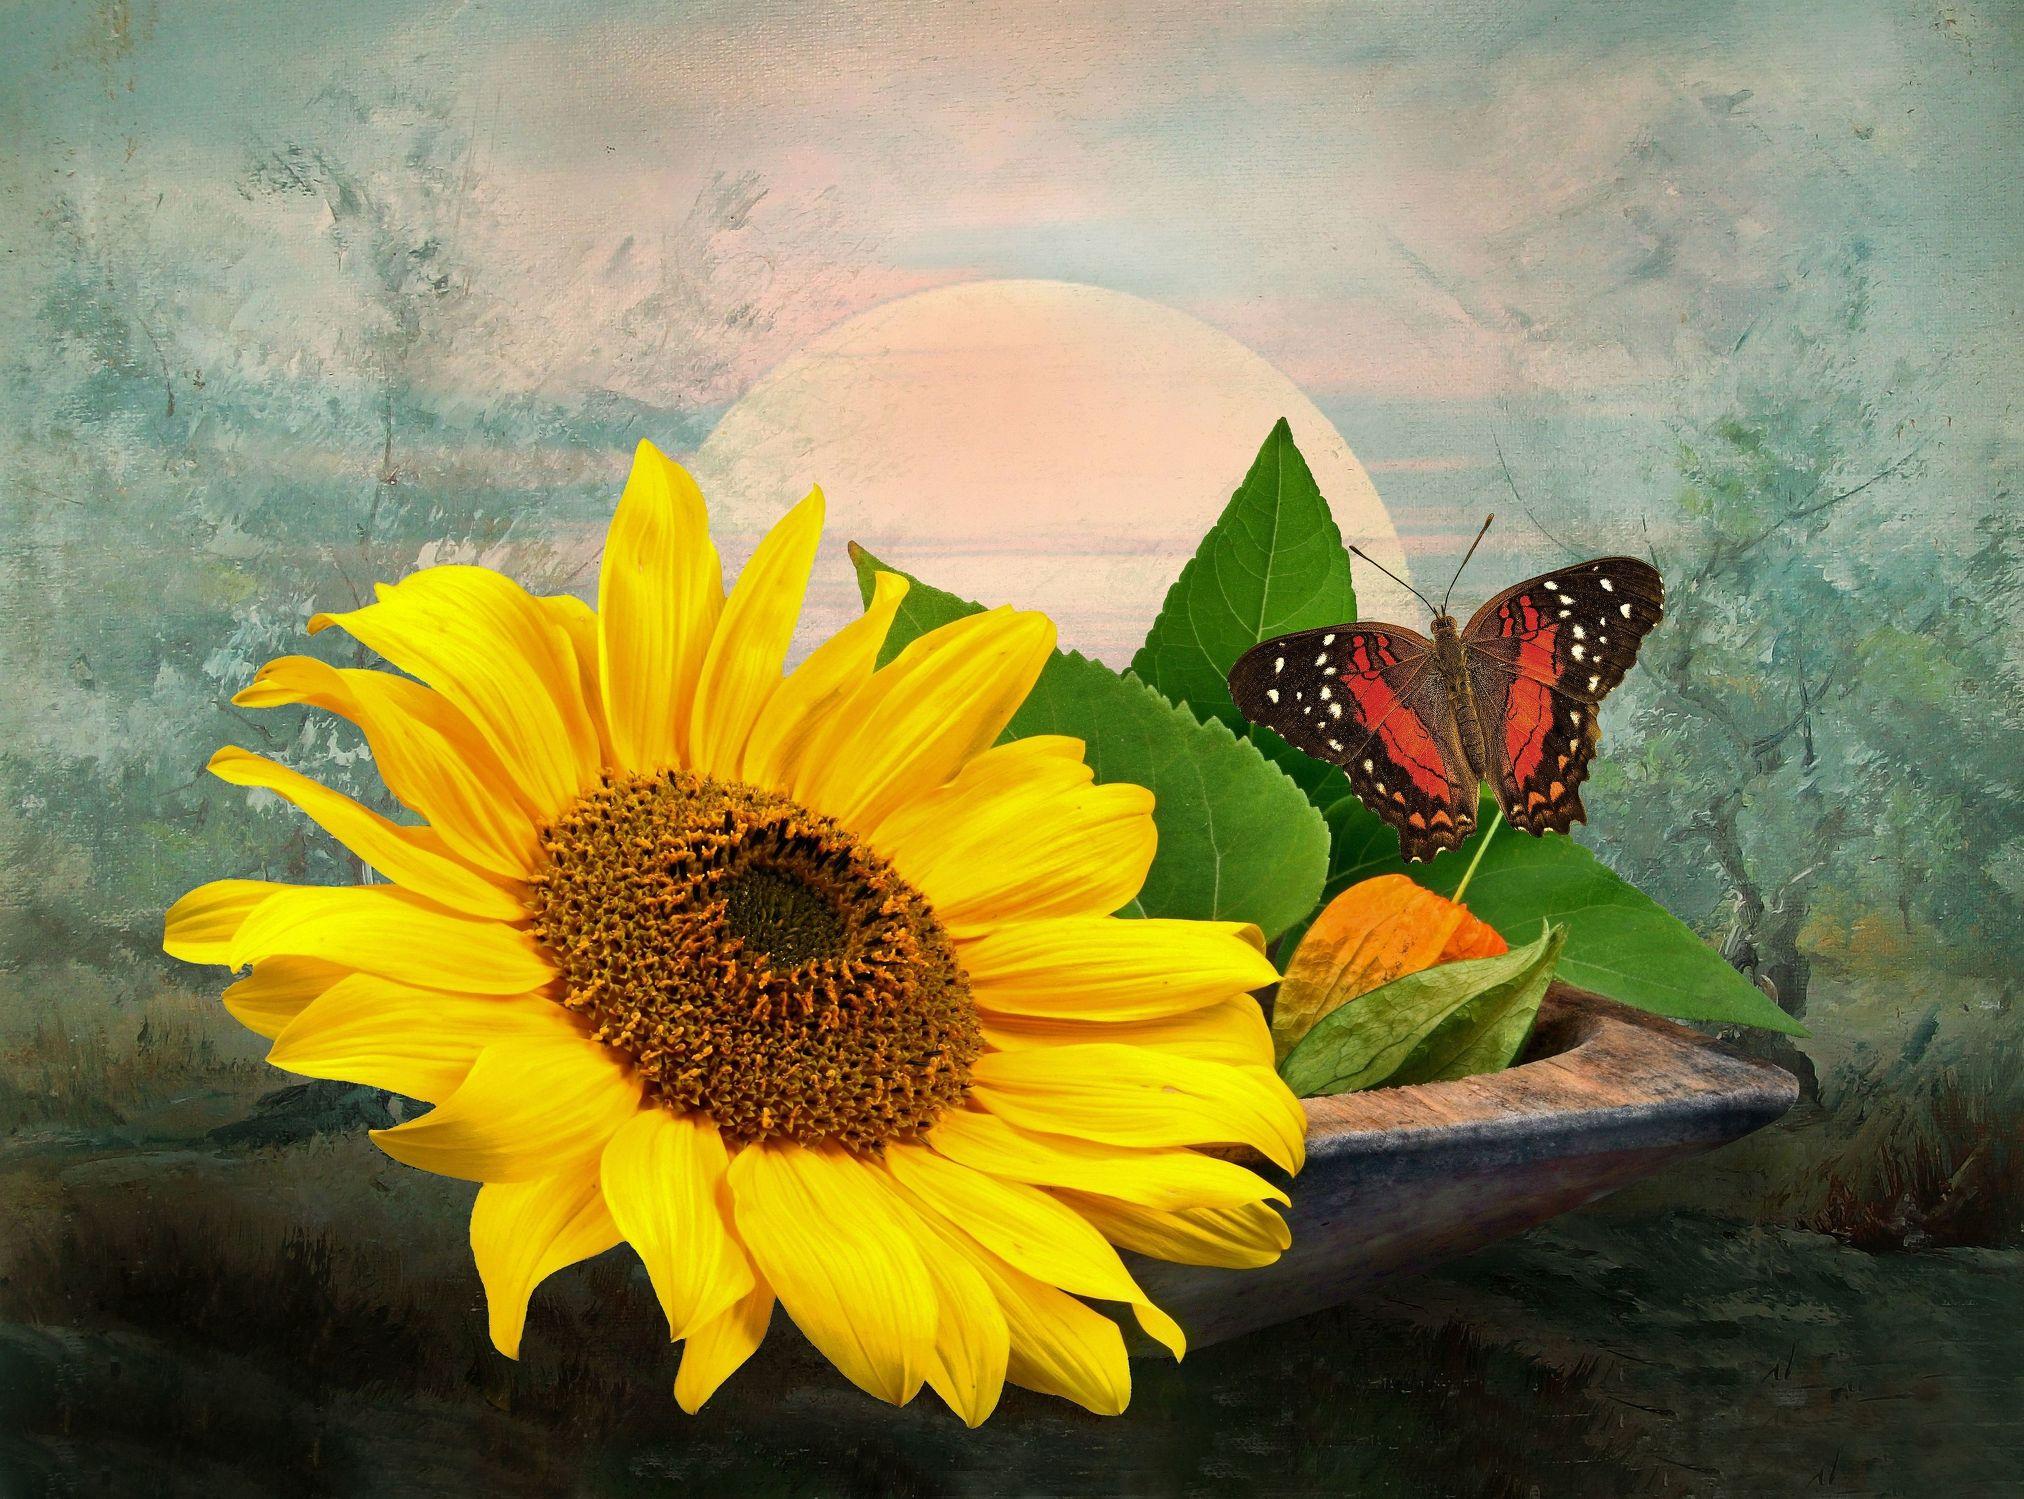 Bild mit Pflanzen, Himmel, Bäume, Blumen, Sonnenblumen, Sonne, Blätter, Landschaft, Blume, Pflanze, Sonnenblume, Blatt, Floral, Toskana, Stilleben, Blüten, Florales, blüte